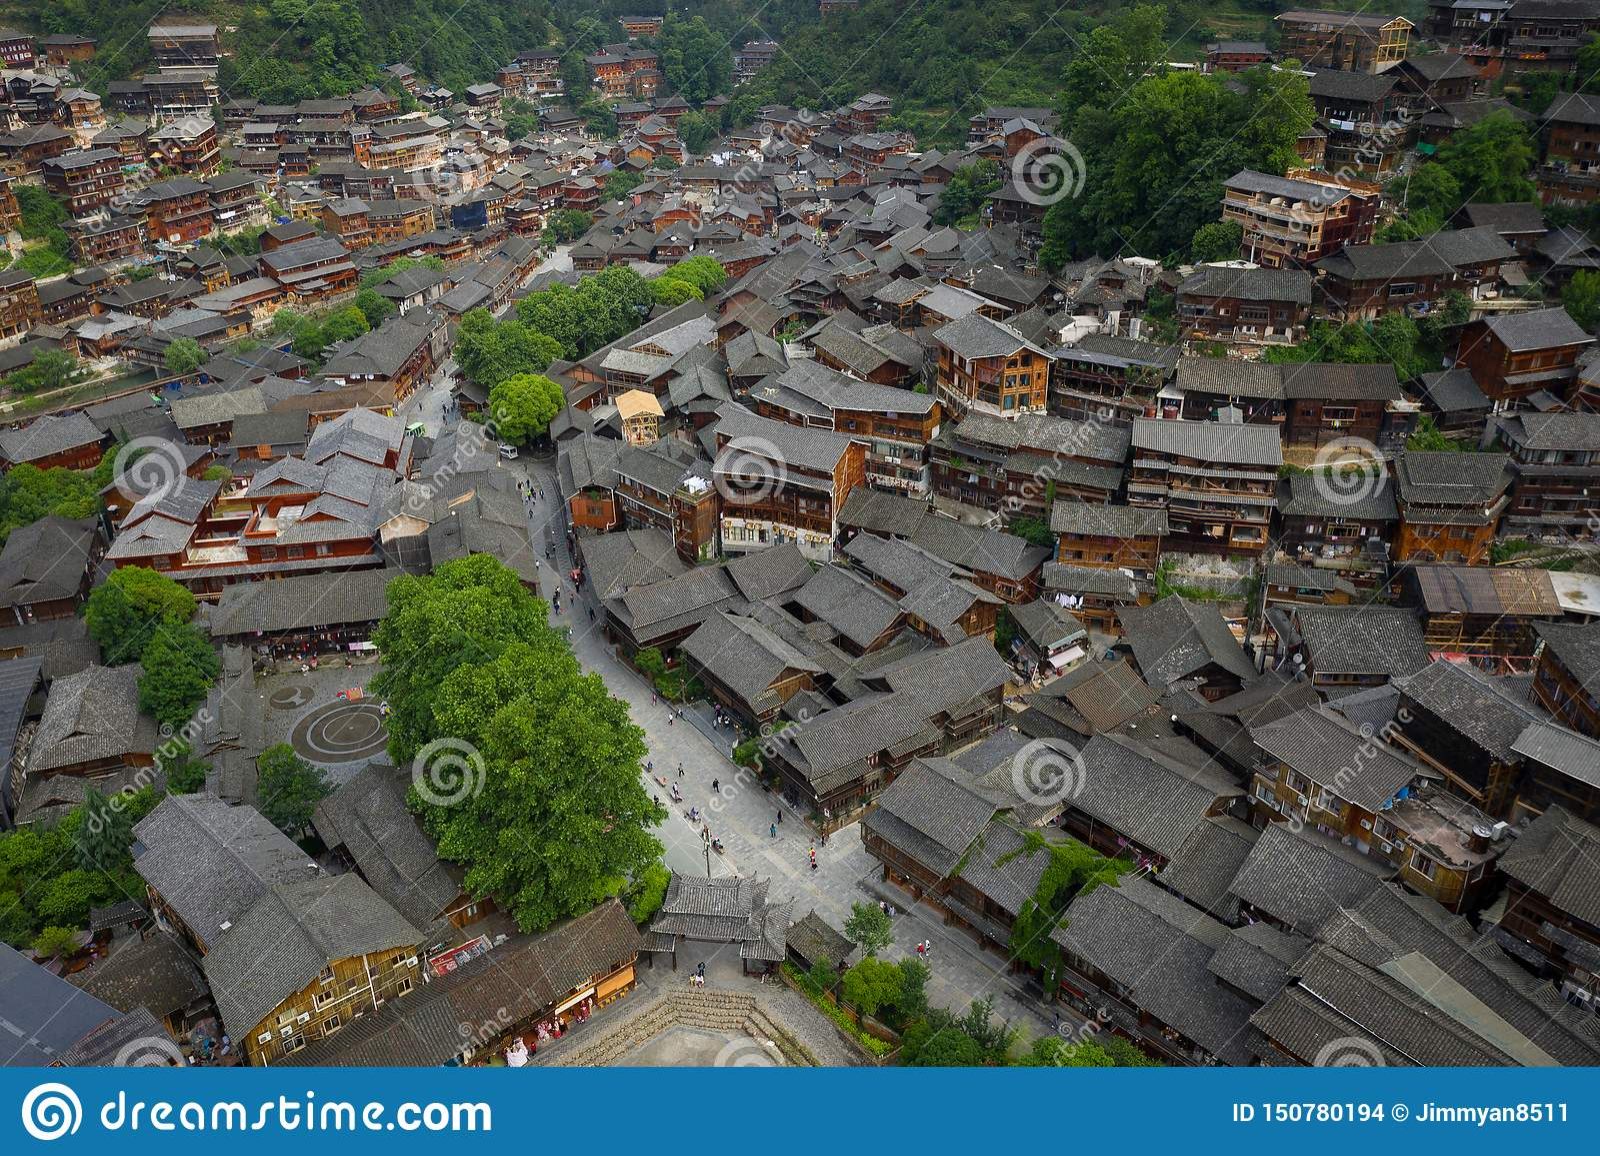 Thousand miao village